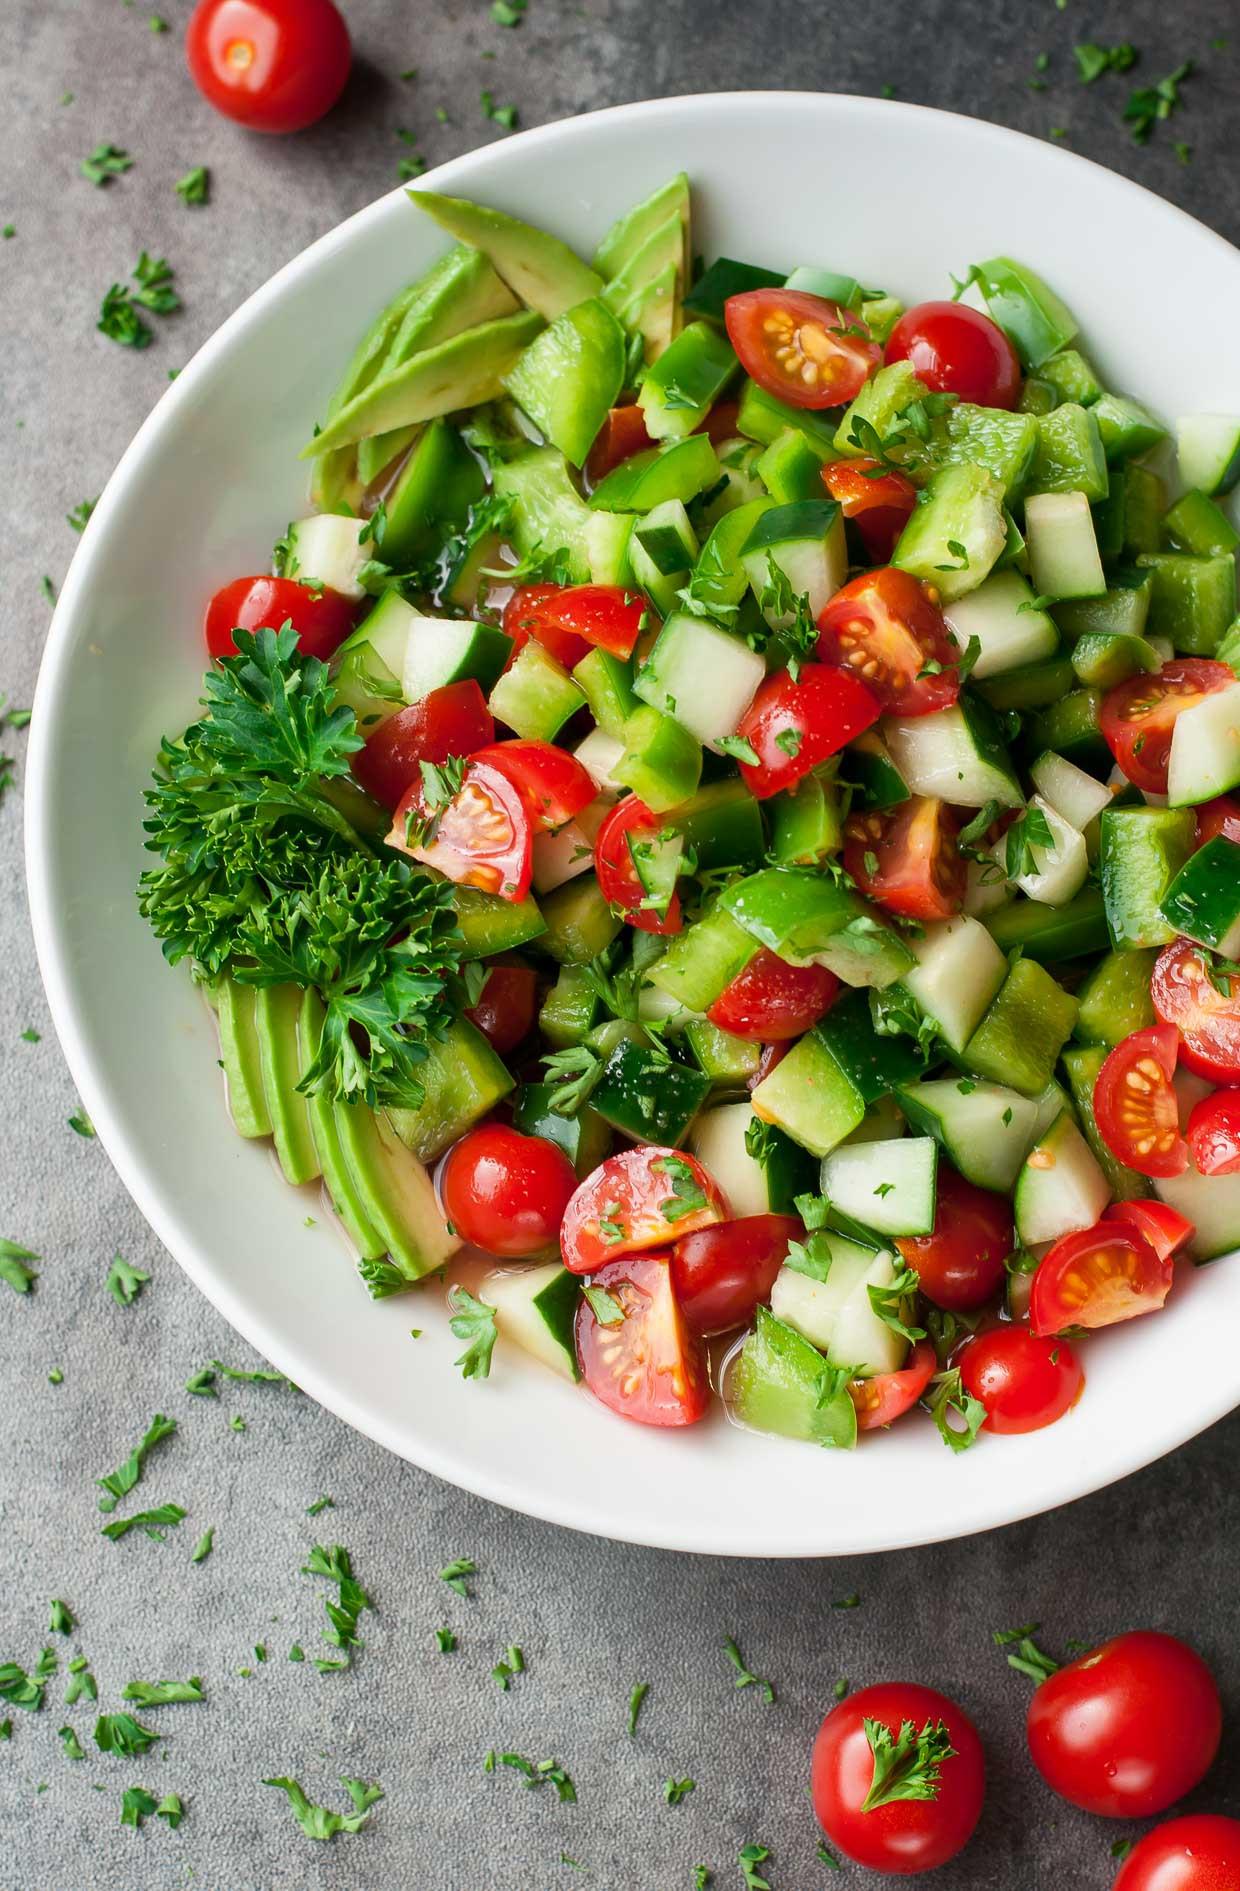 Healthy Tasty Salads  Healthy Tomato Cucumber Avocado Salad